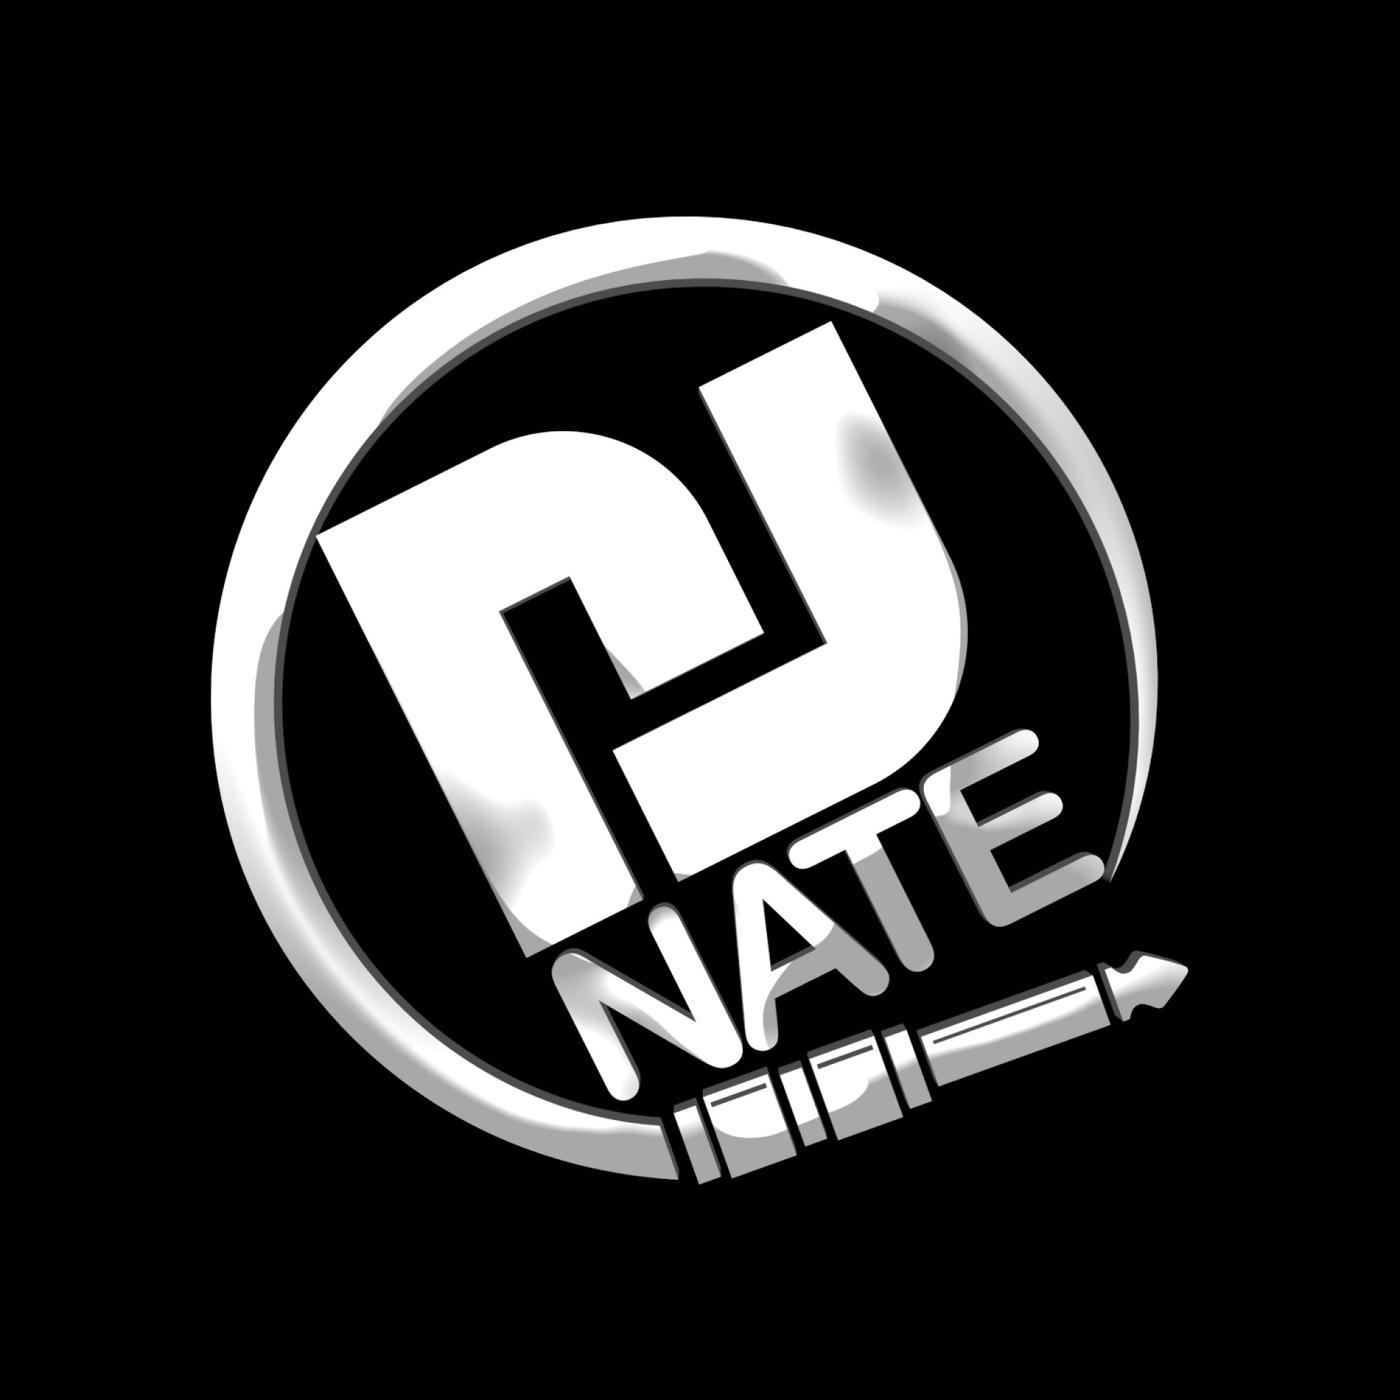 DJ Nate's Mixes Podcast - DJ Nate | Listen Notes